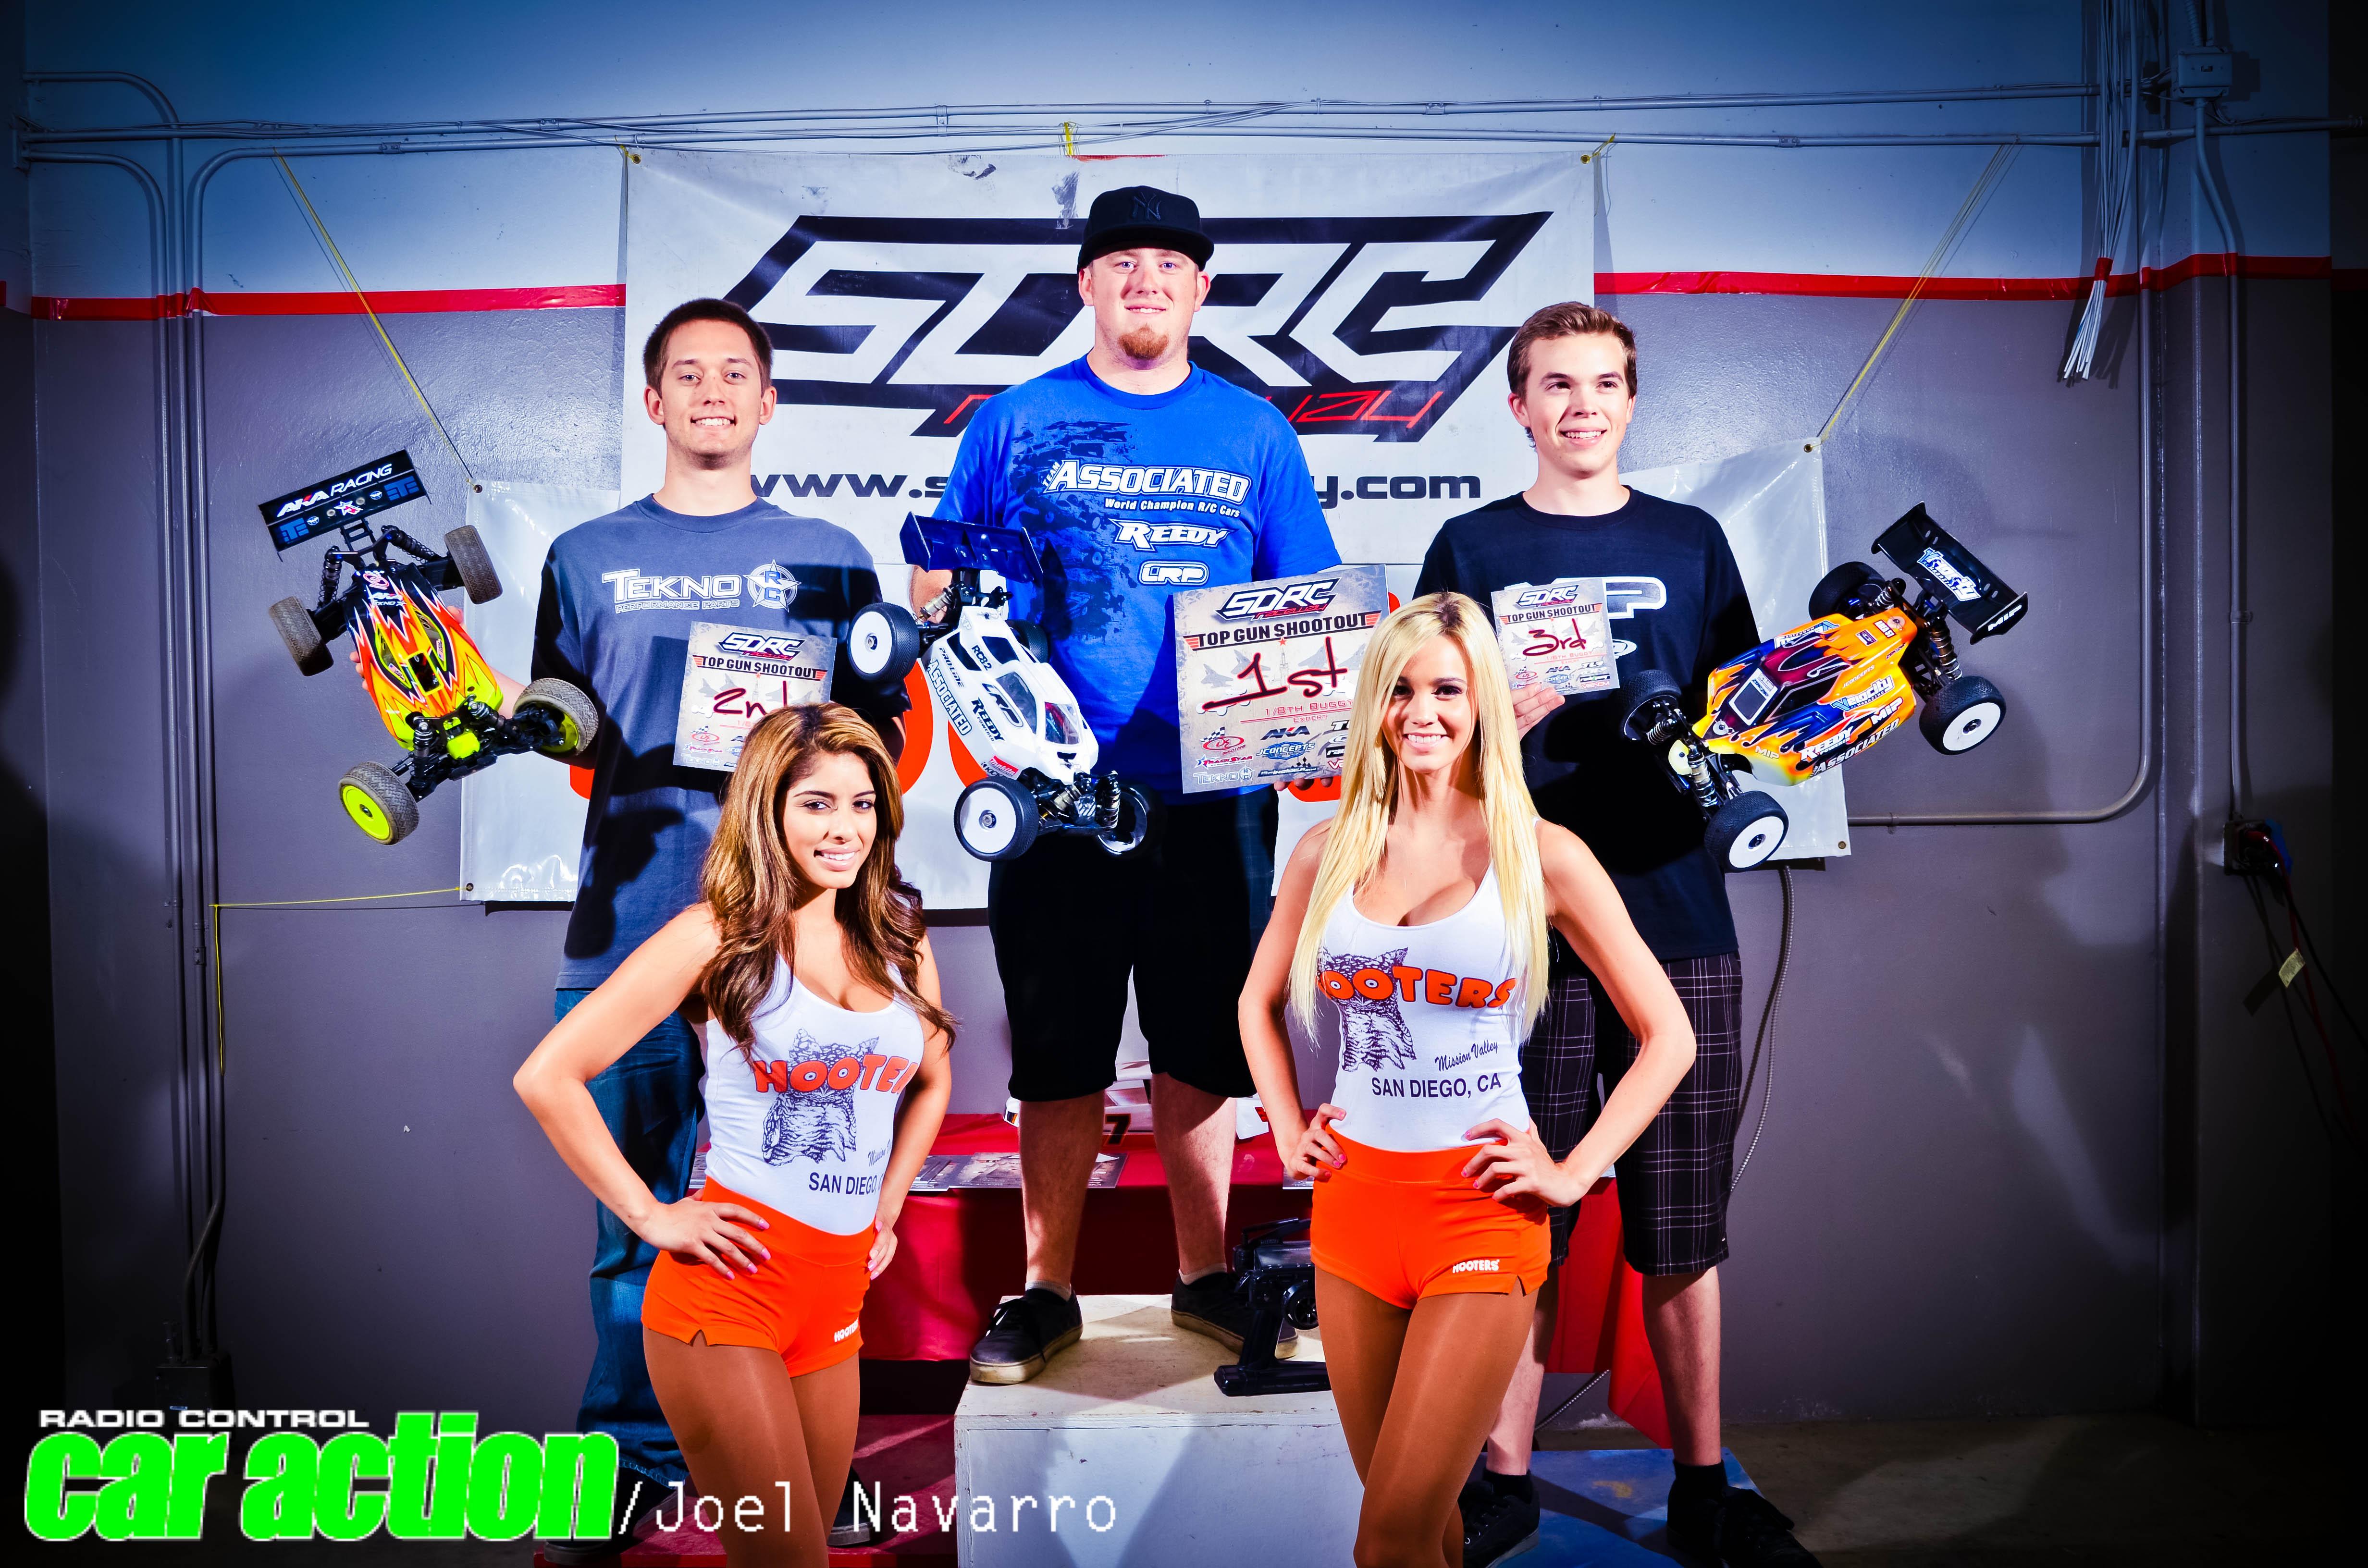 1/8th Scale Buggy Expert  1)  Chris Jarosz  2)  Lucas Sanford  3)  Matt Olson